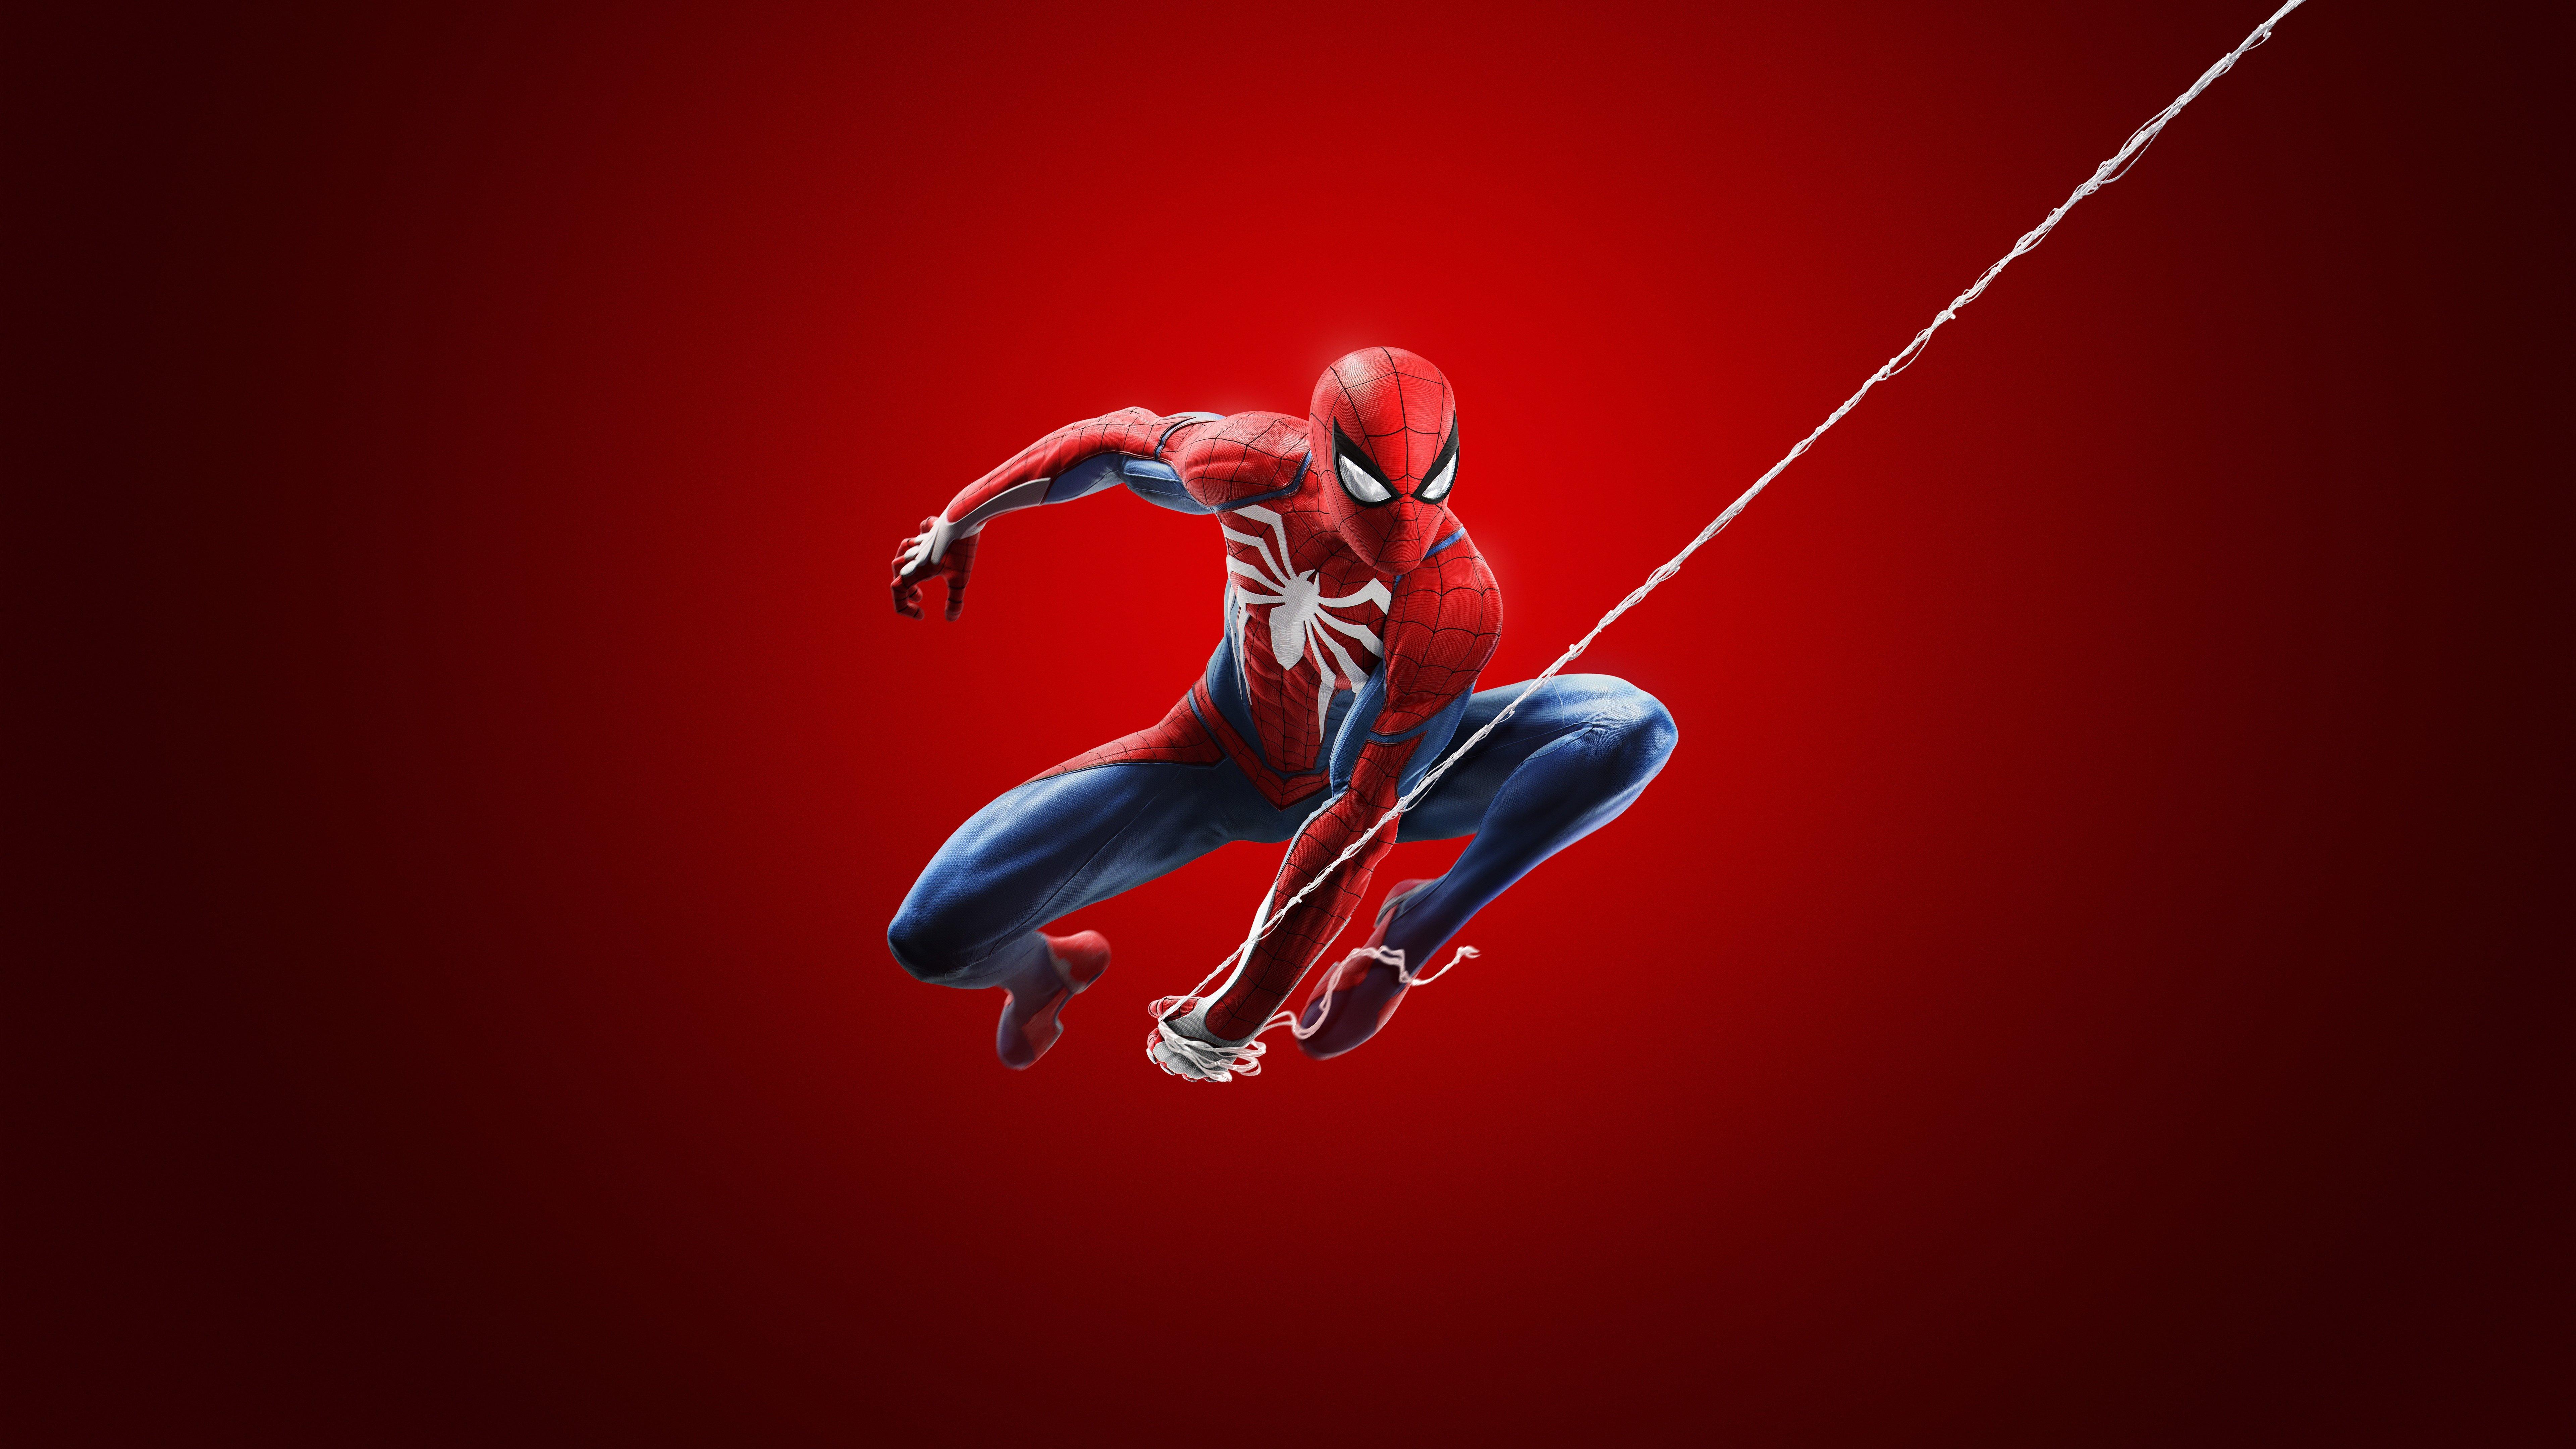 Fondos de pantalla Spider-Man PS4